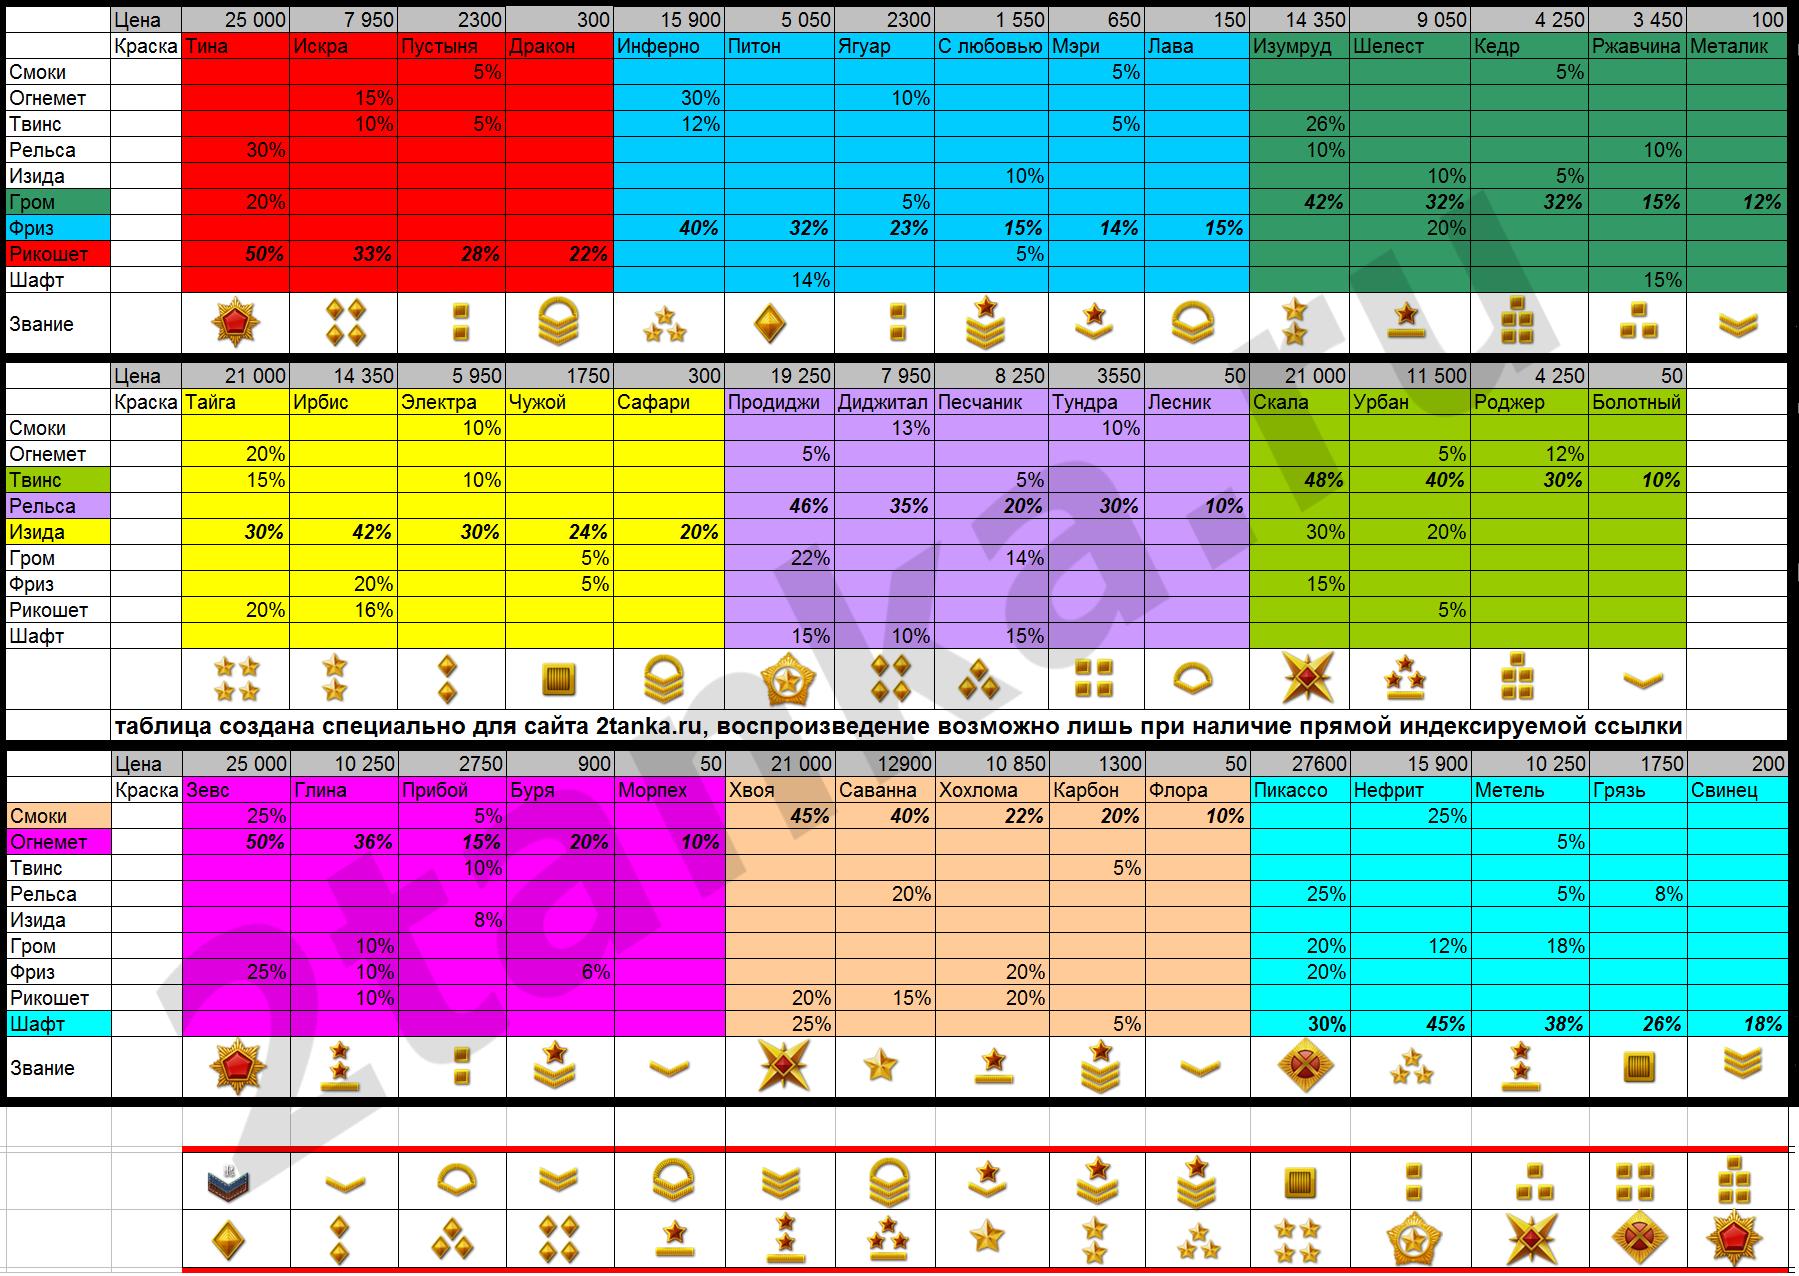 Таблица для выбора краски а Танках онлайн